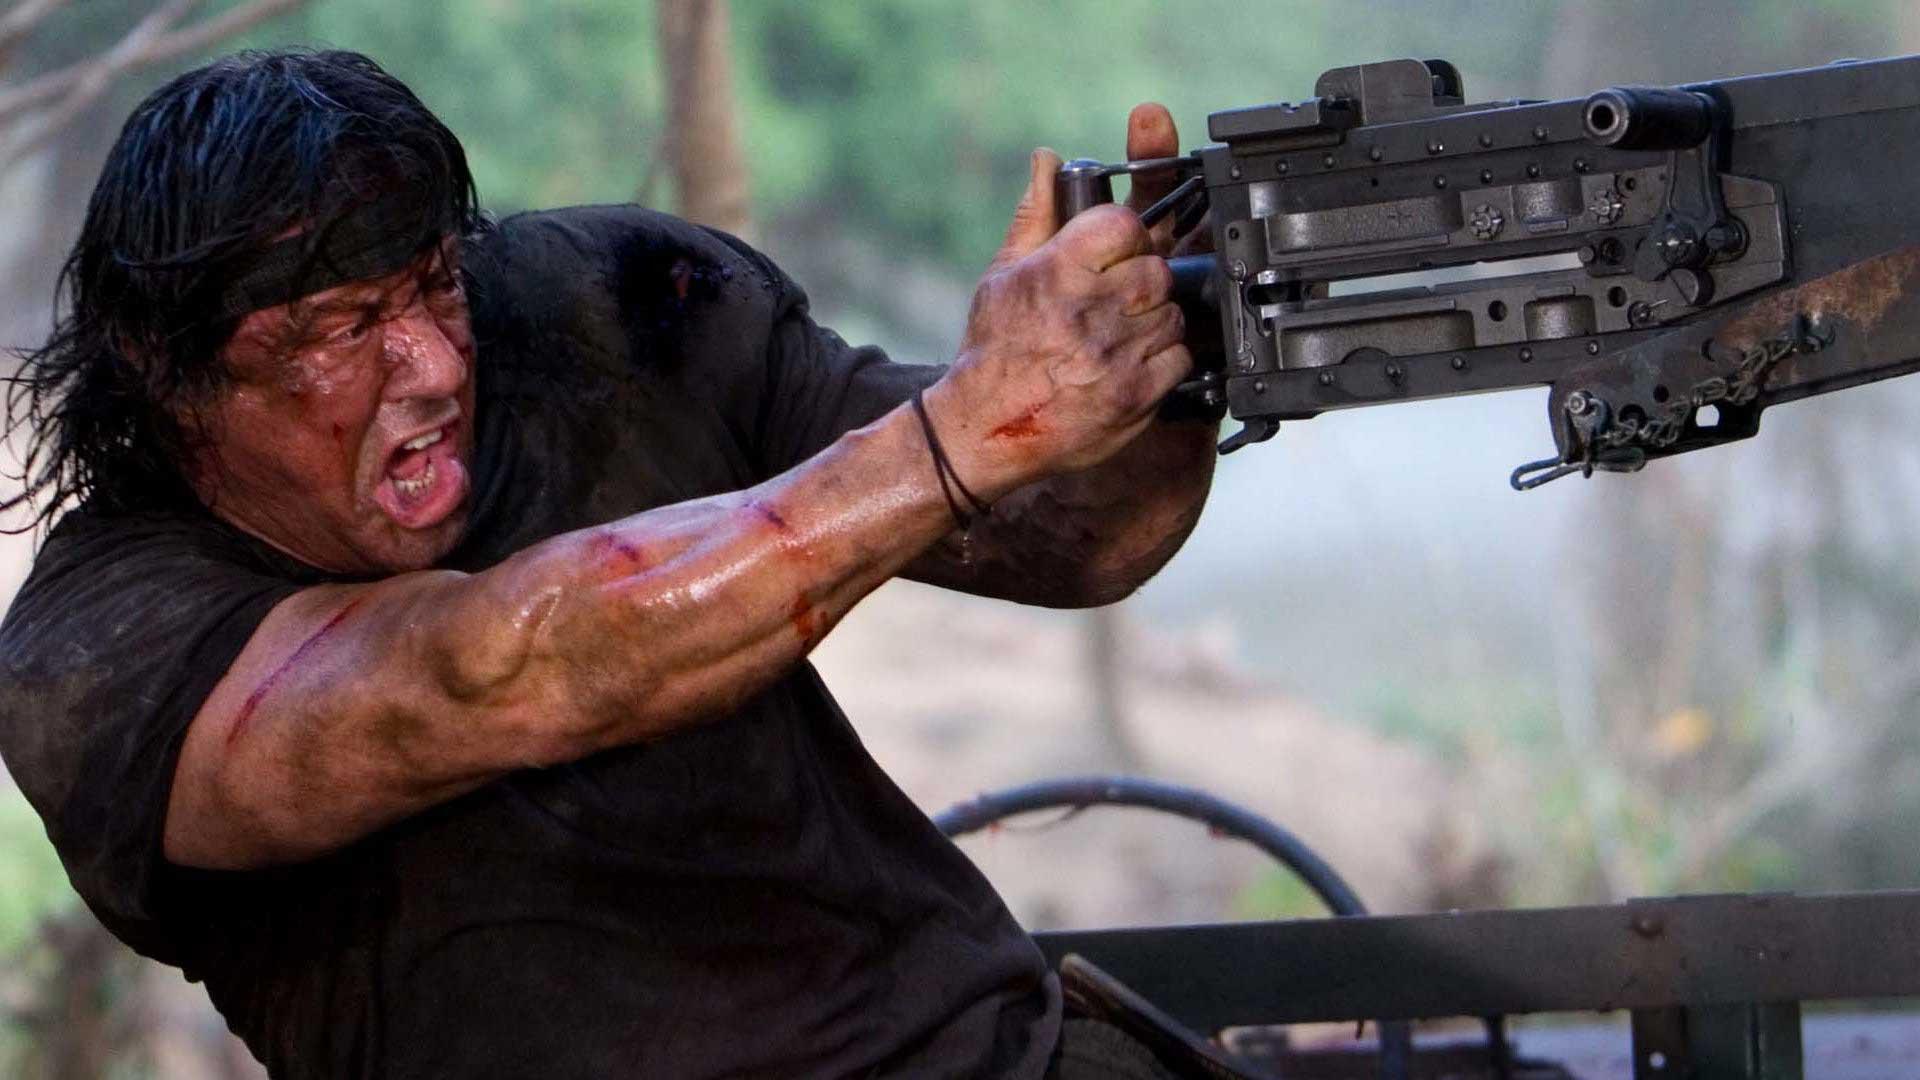 Facebook Like Machine Gun Gif Facebook like machine gunFacebook Like Machine Gun Gif